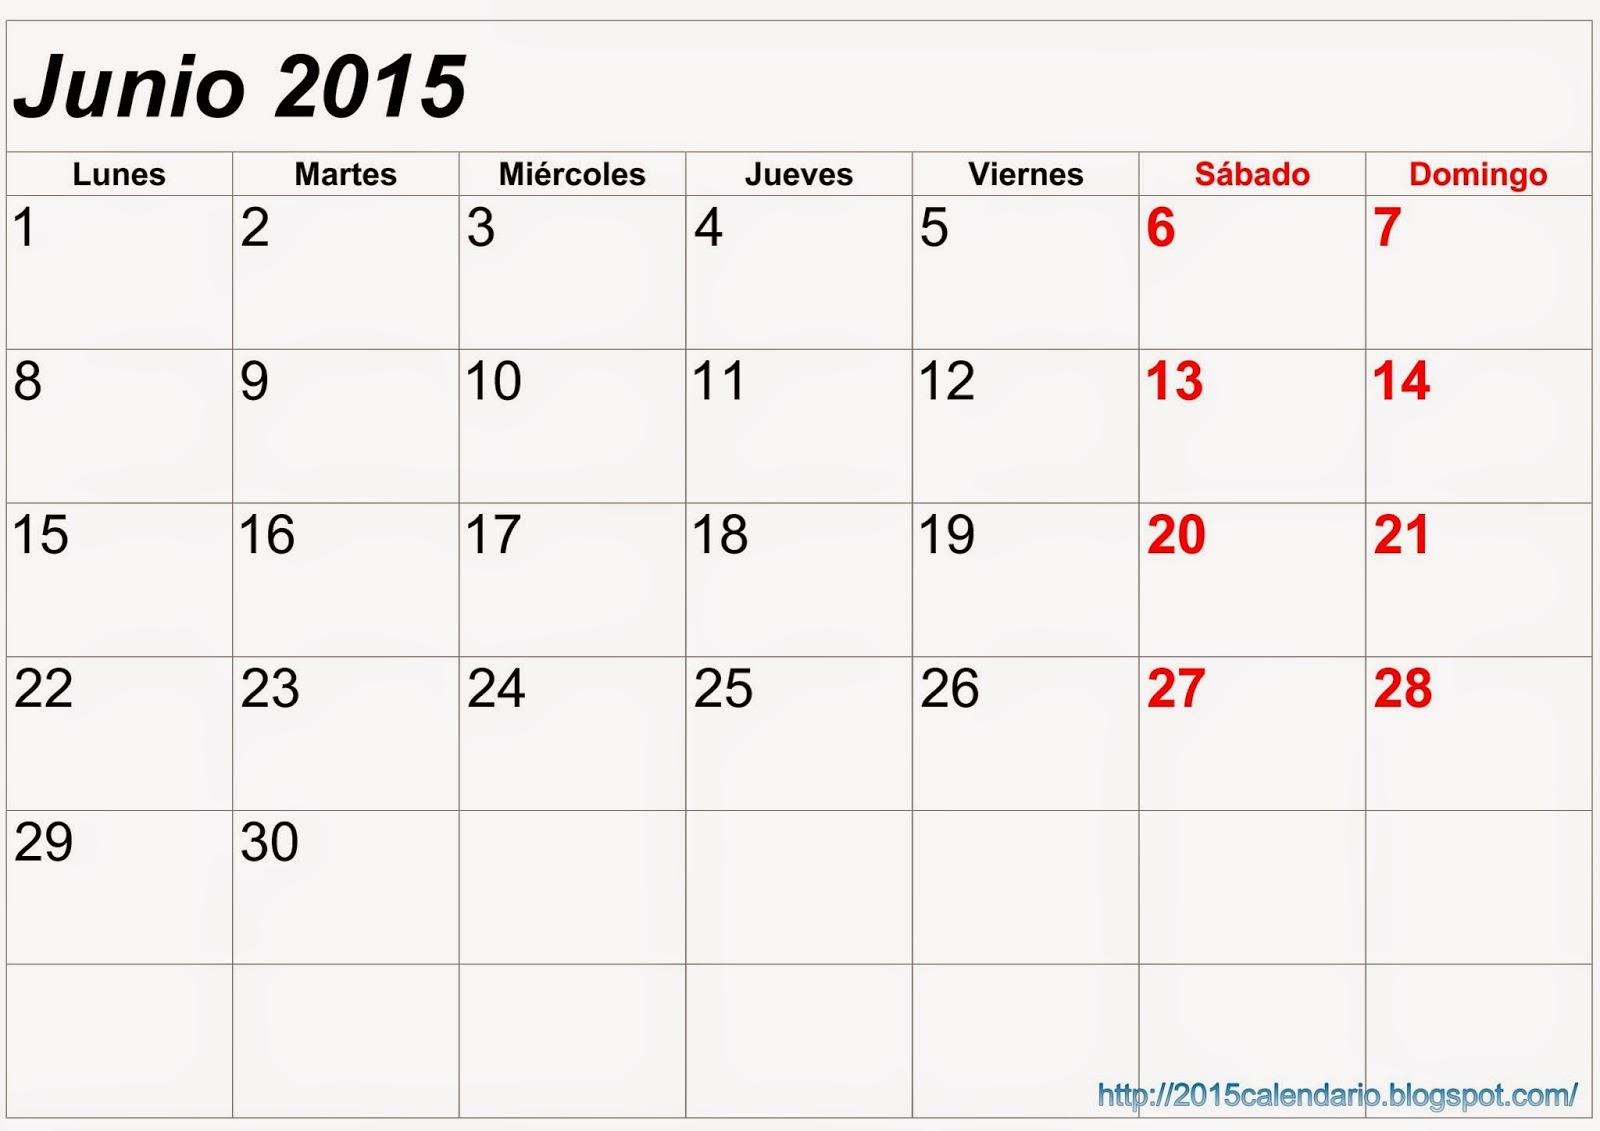 Menguante en junio 2015 new calendar template site for Calendario lunar junio